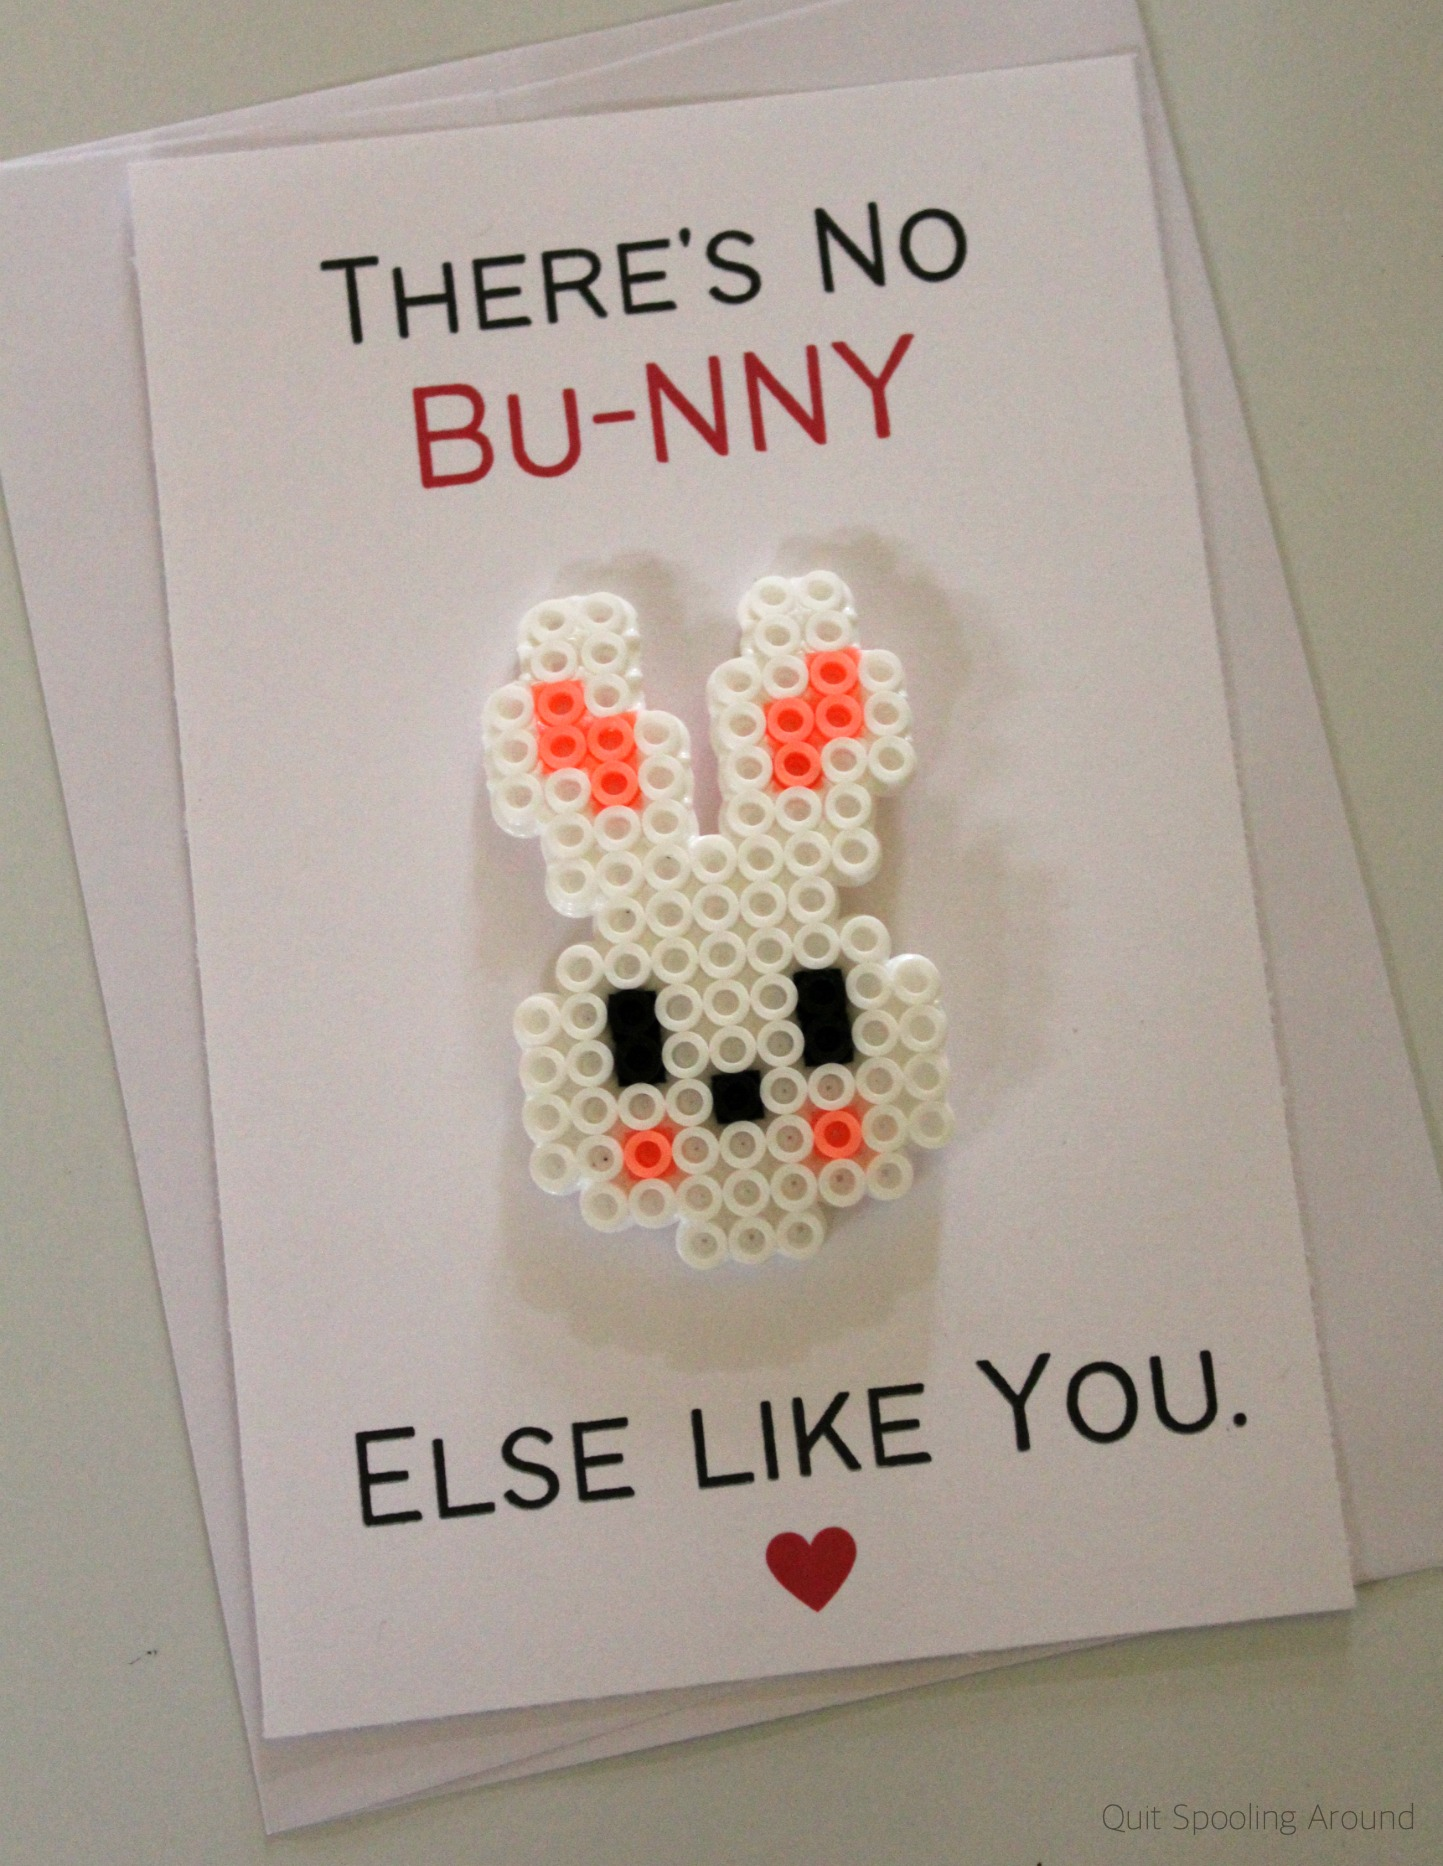 No Bunny Else Like You